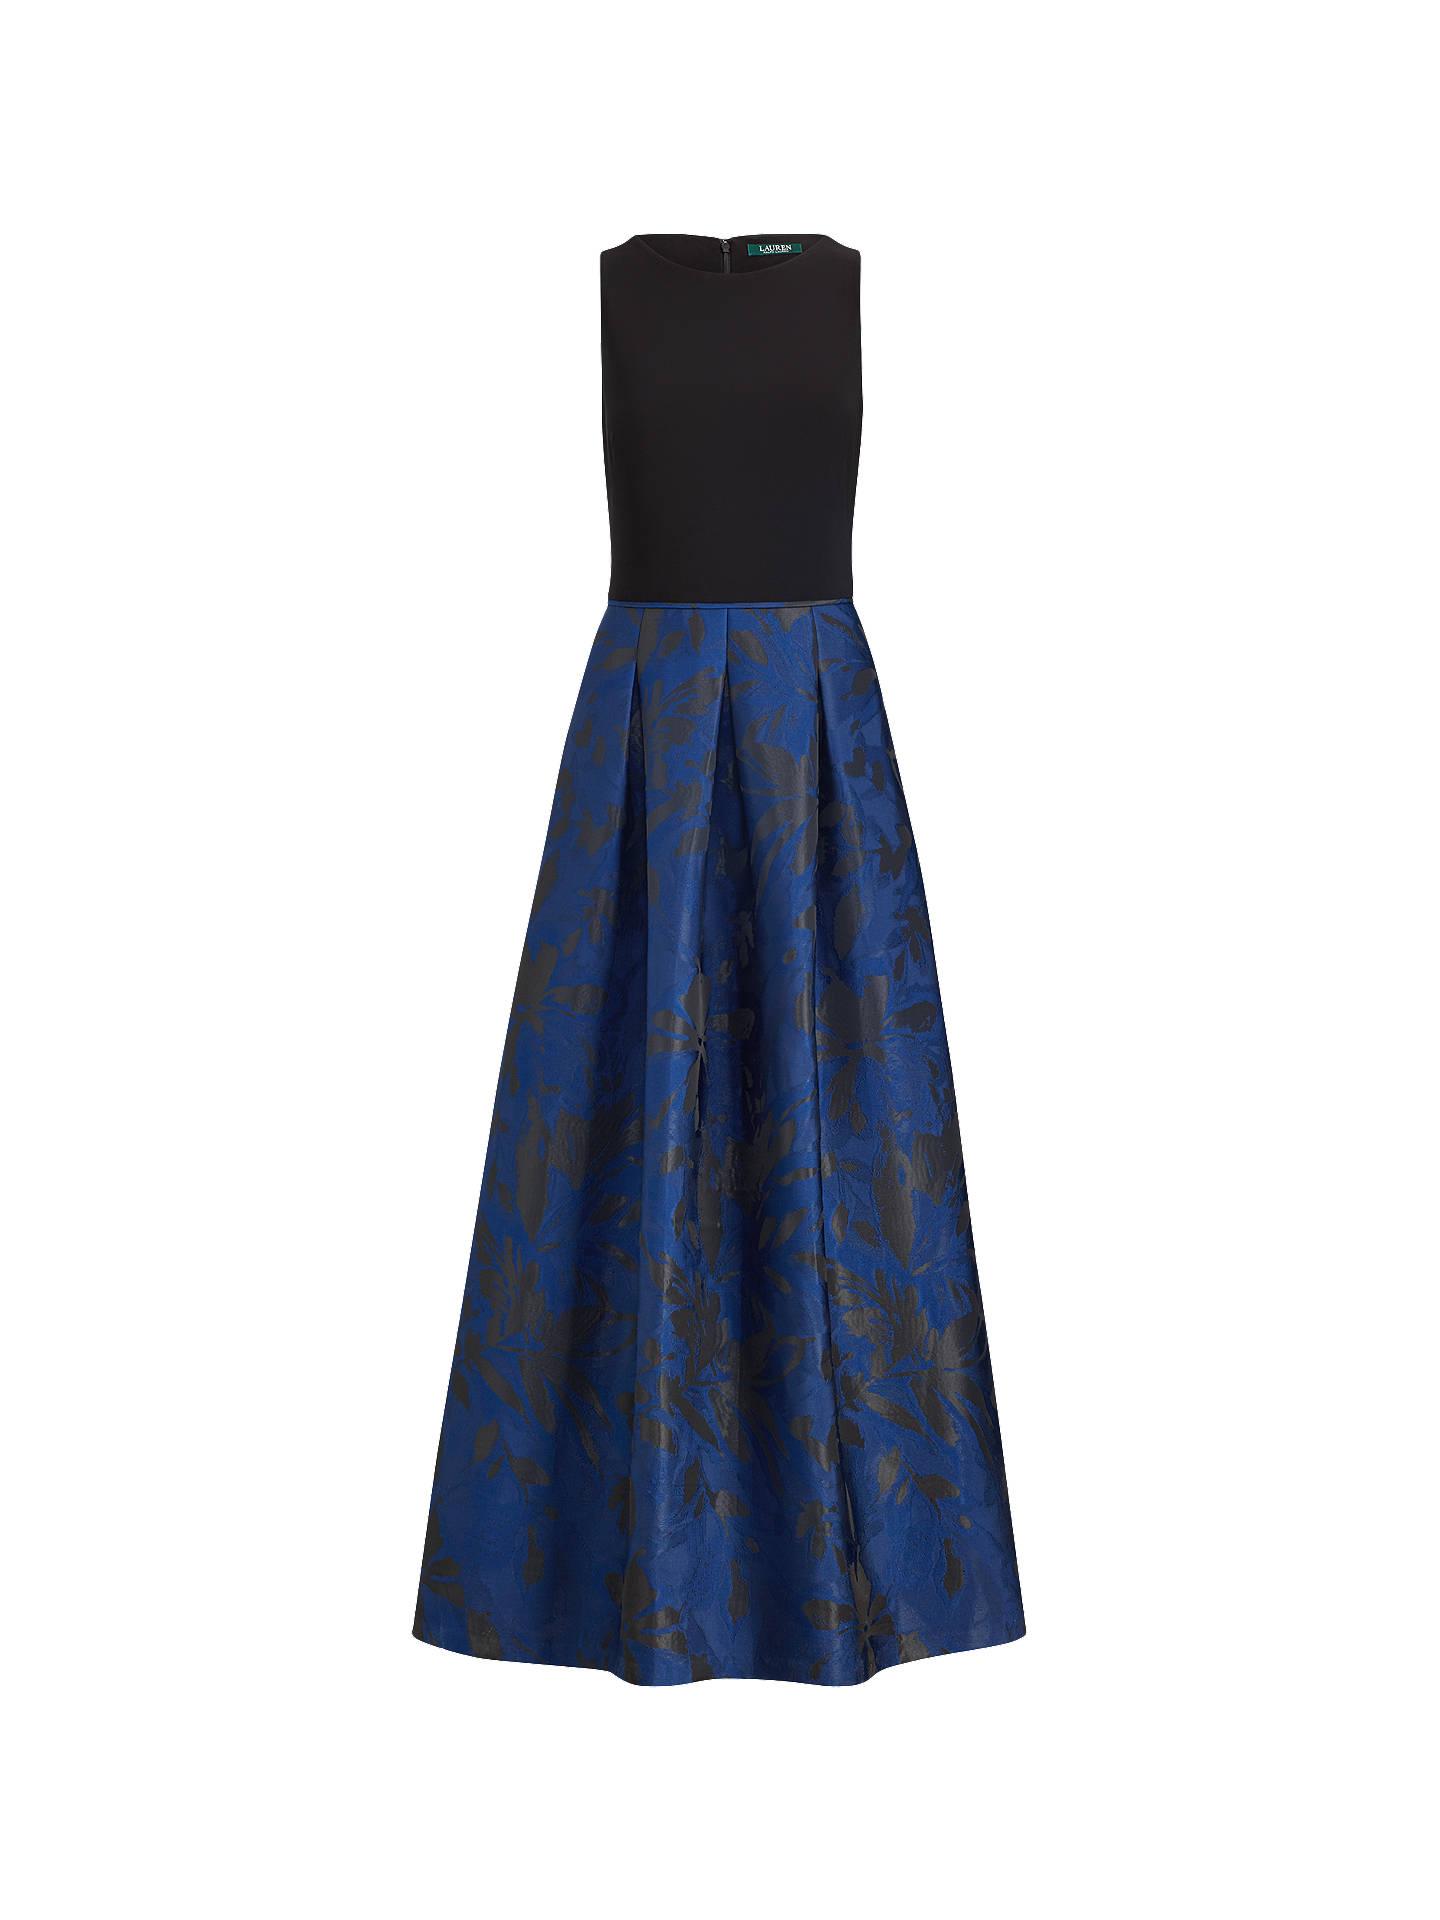 Lauren Ralph Lauren Leydena Maxi Dress, Dutch Blue/Black at